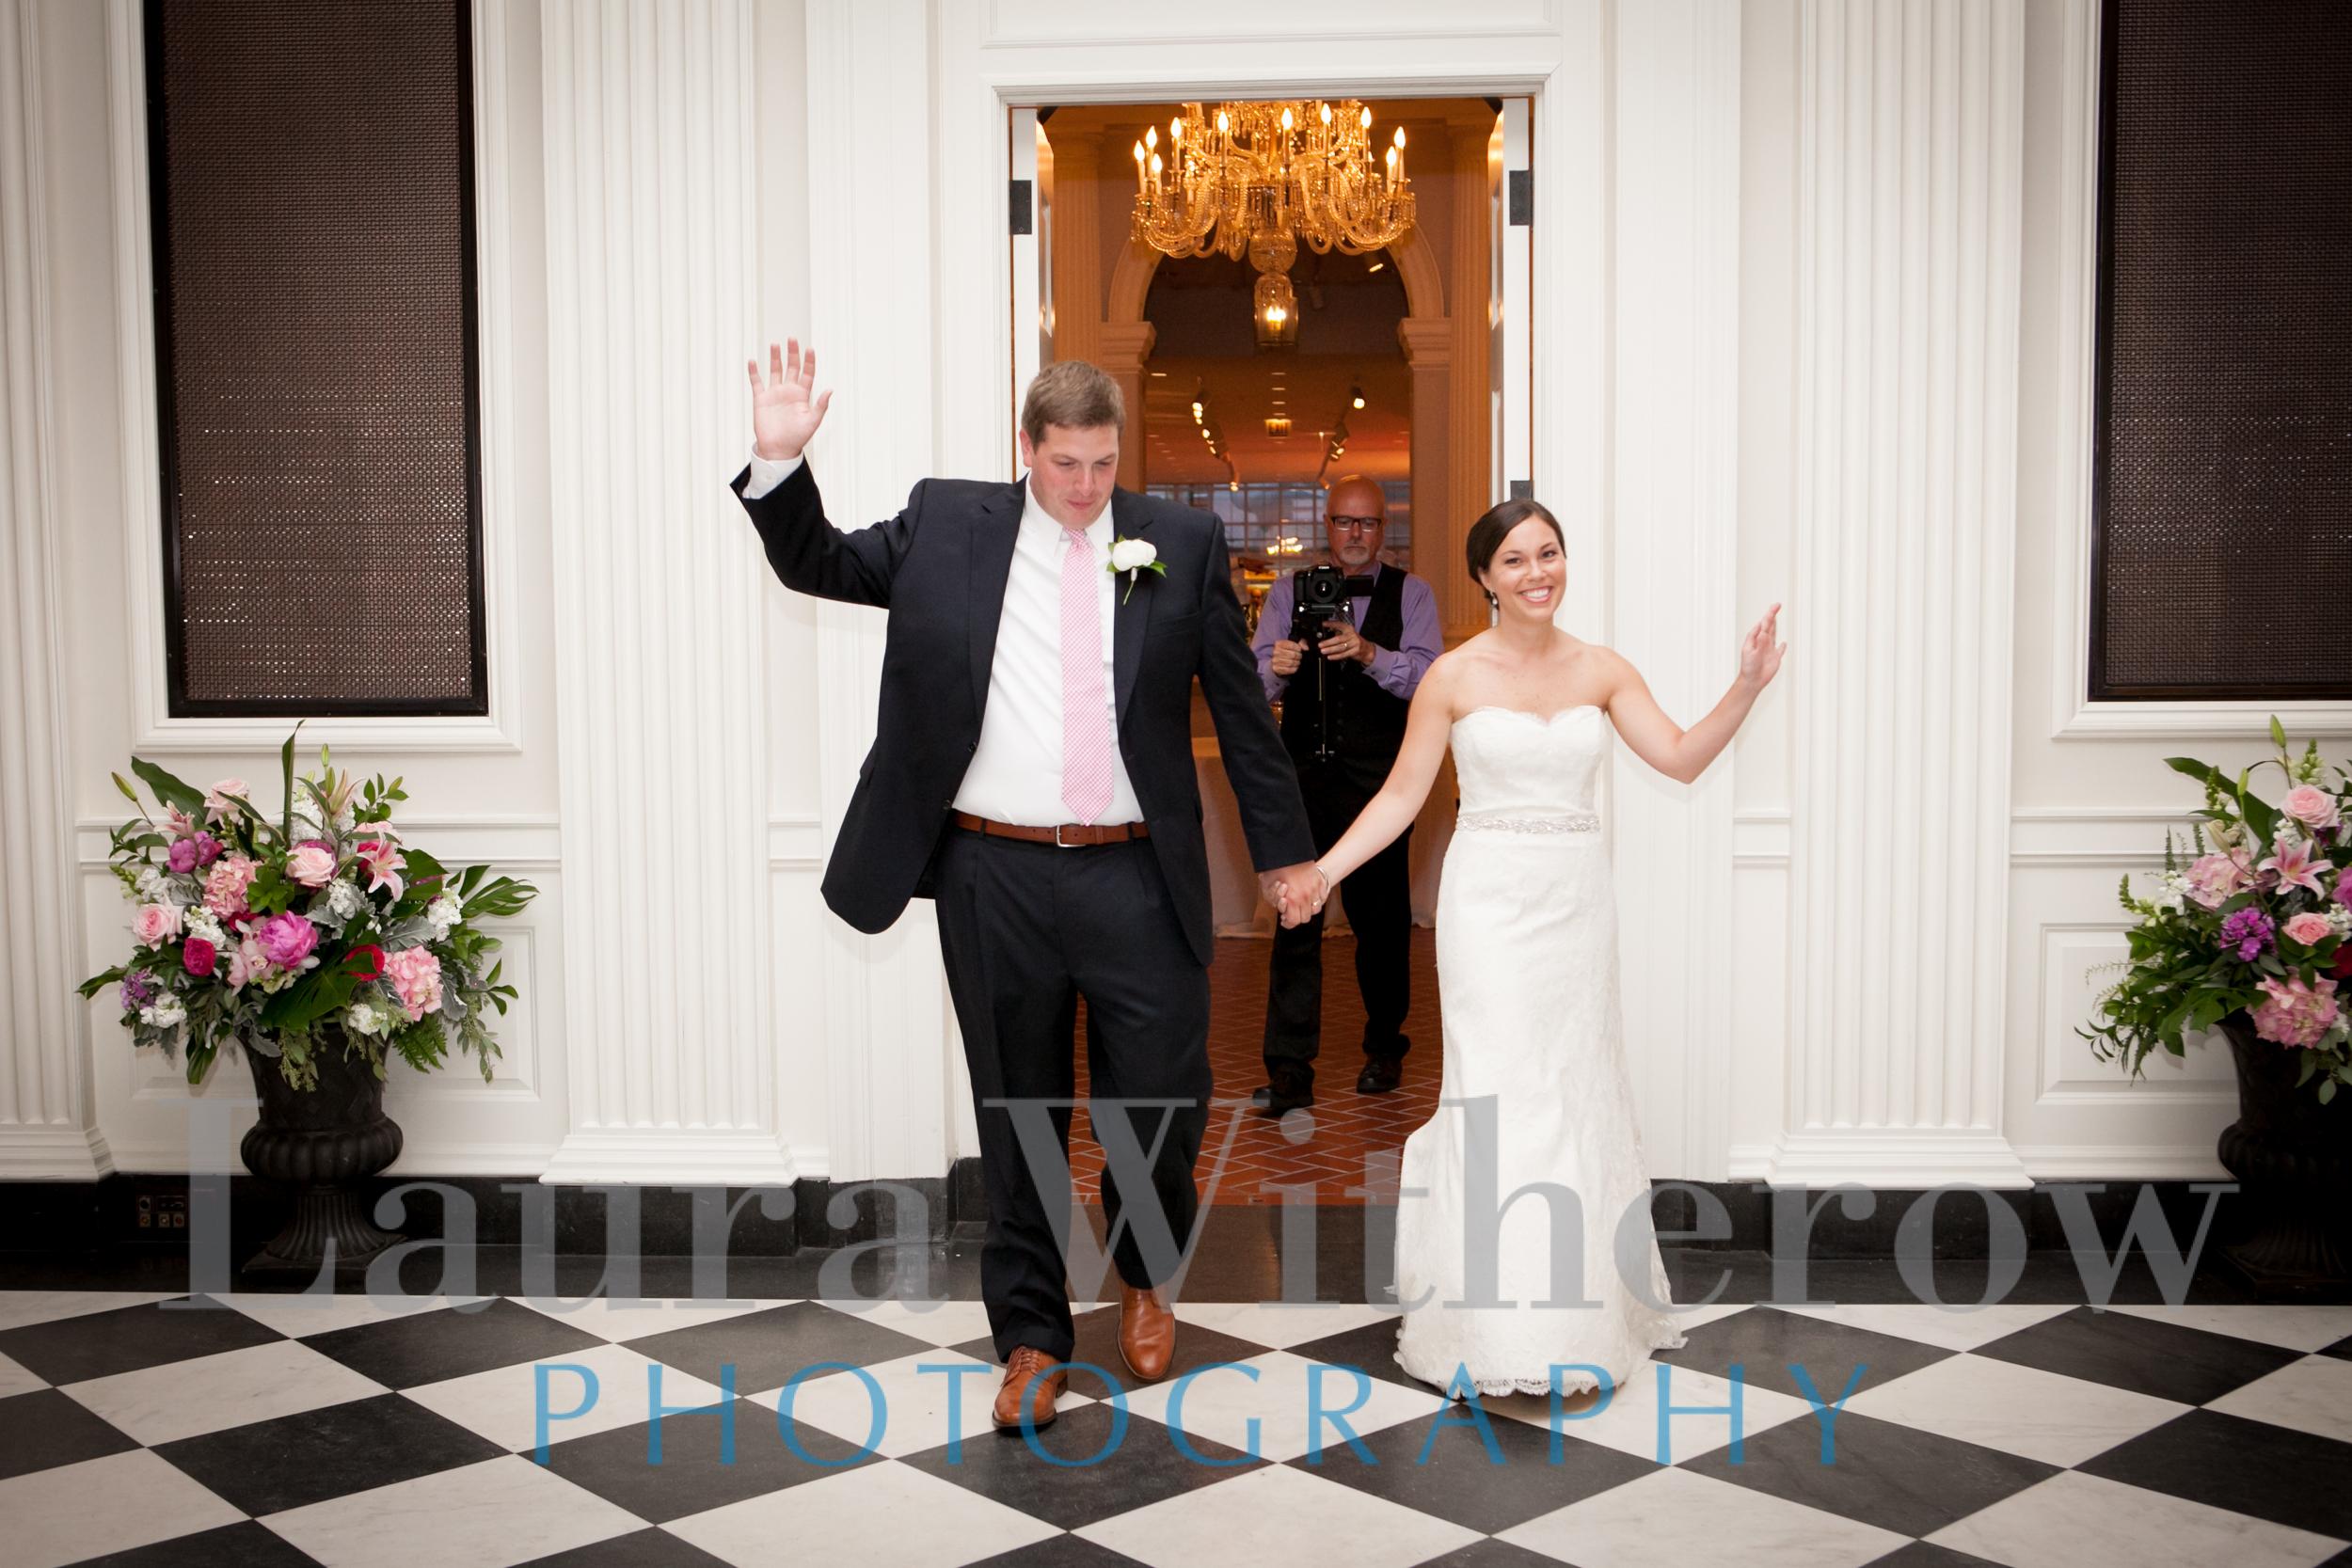 wedding-photographer-chicago-chm.jpg